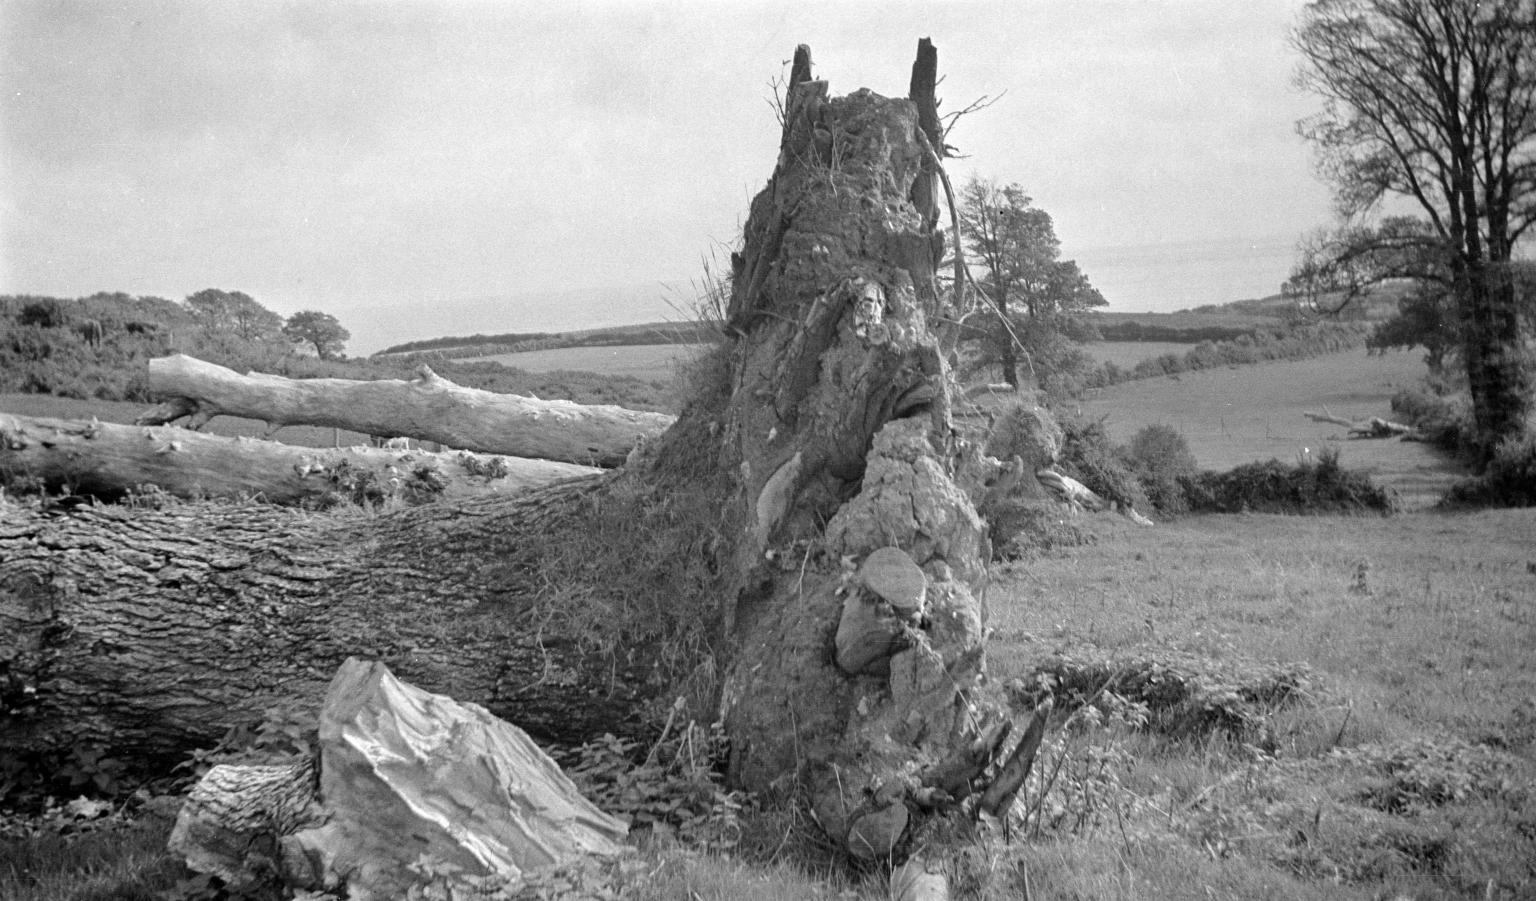 Paul Nash, Stalking Horse, 1941